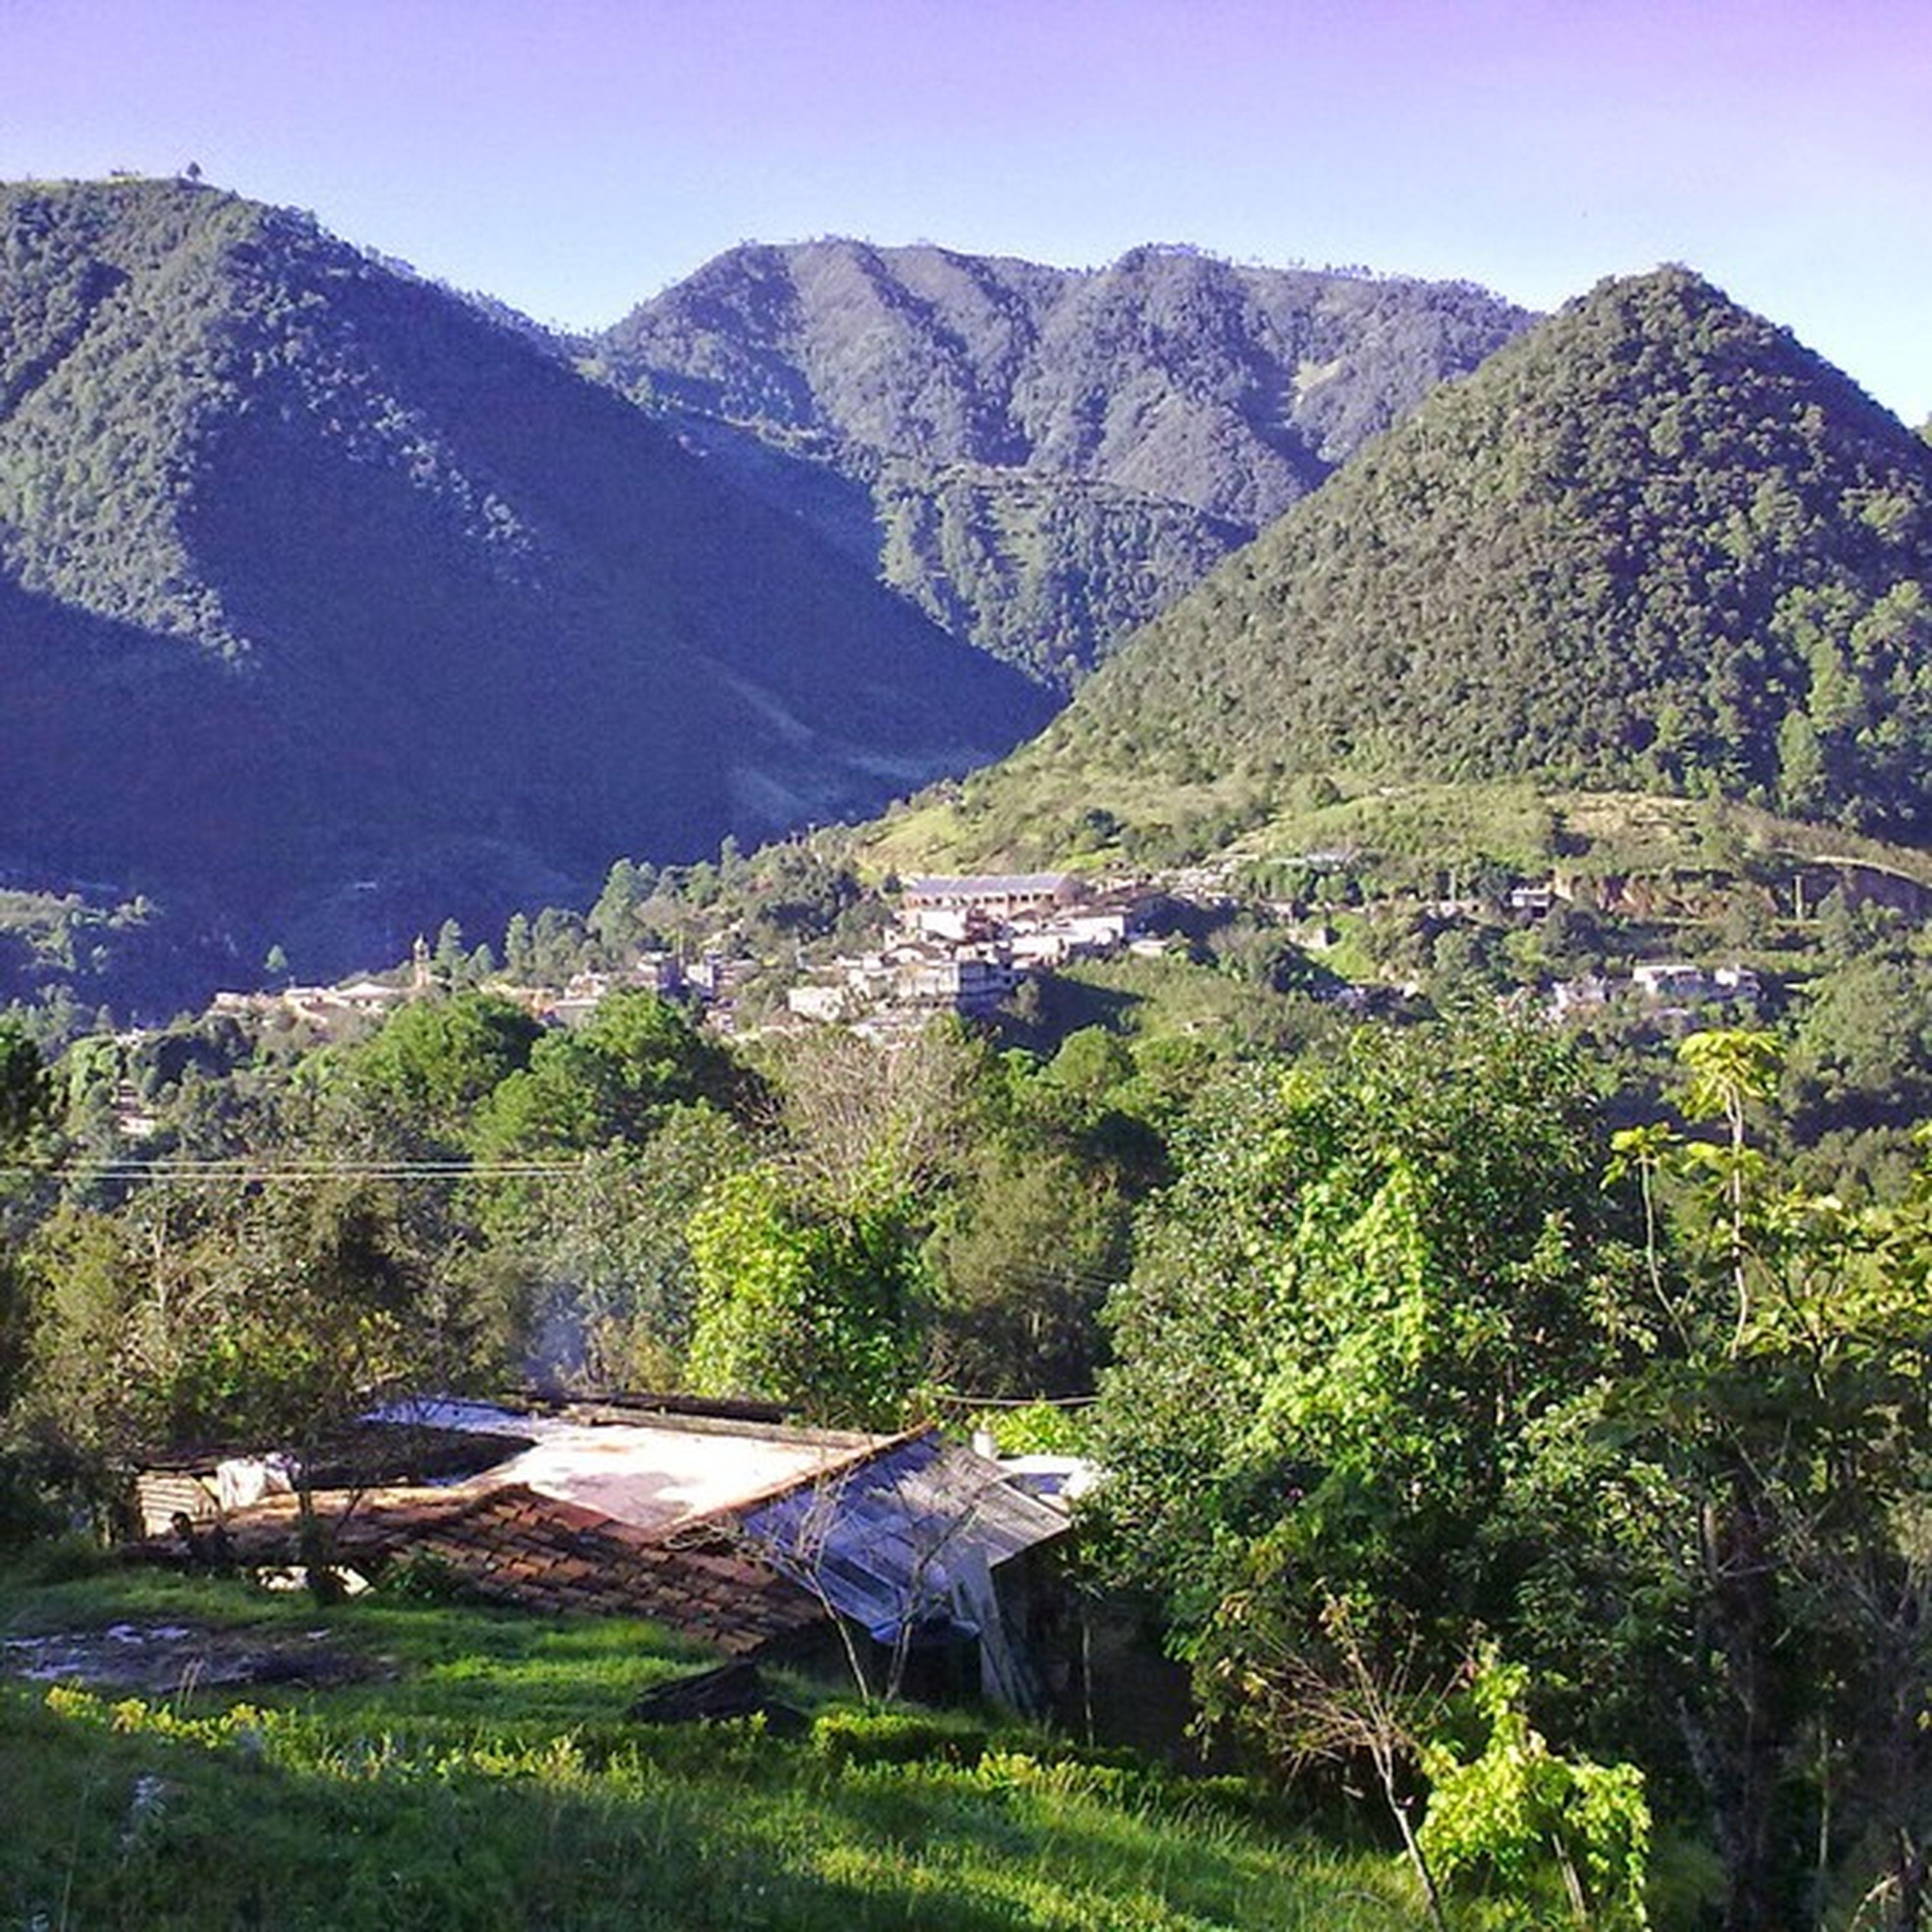 Sierra Norte de Puebla, Ometepec The Great Outdoors - 2015 EyeEm Awards Puebla Ometepetl Sierra Norte Mexico Mountains